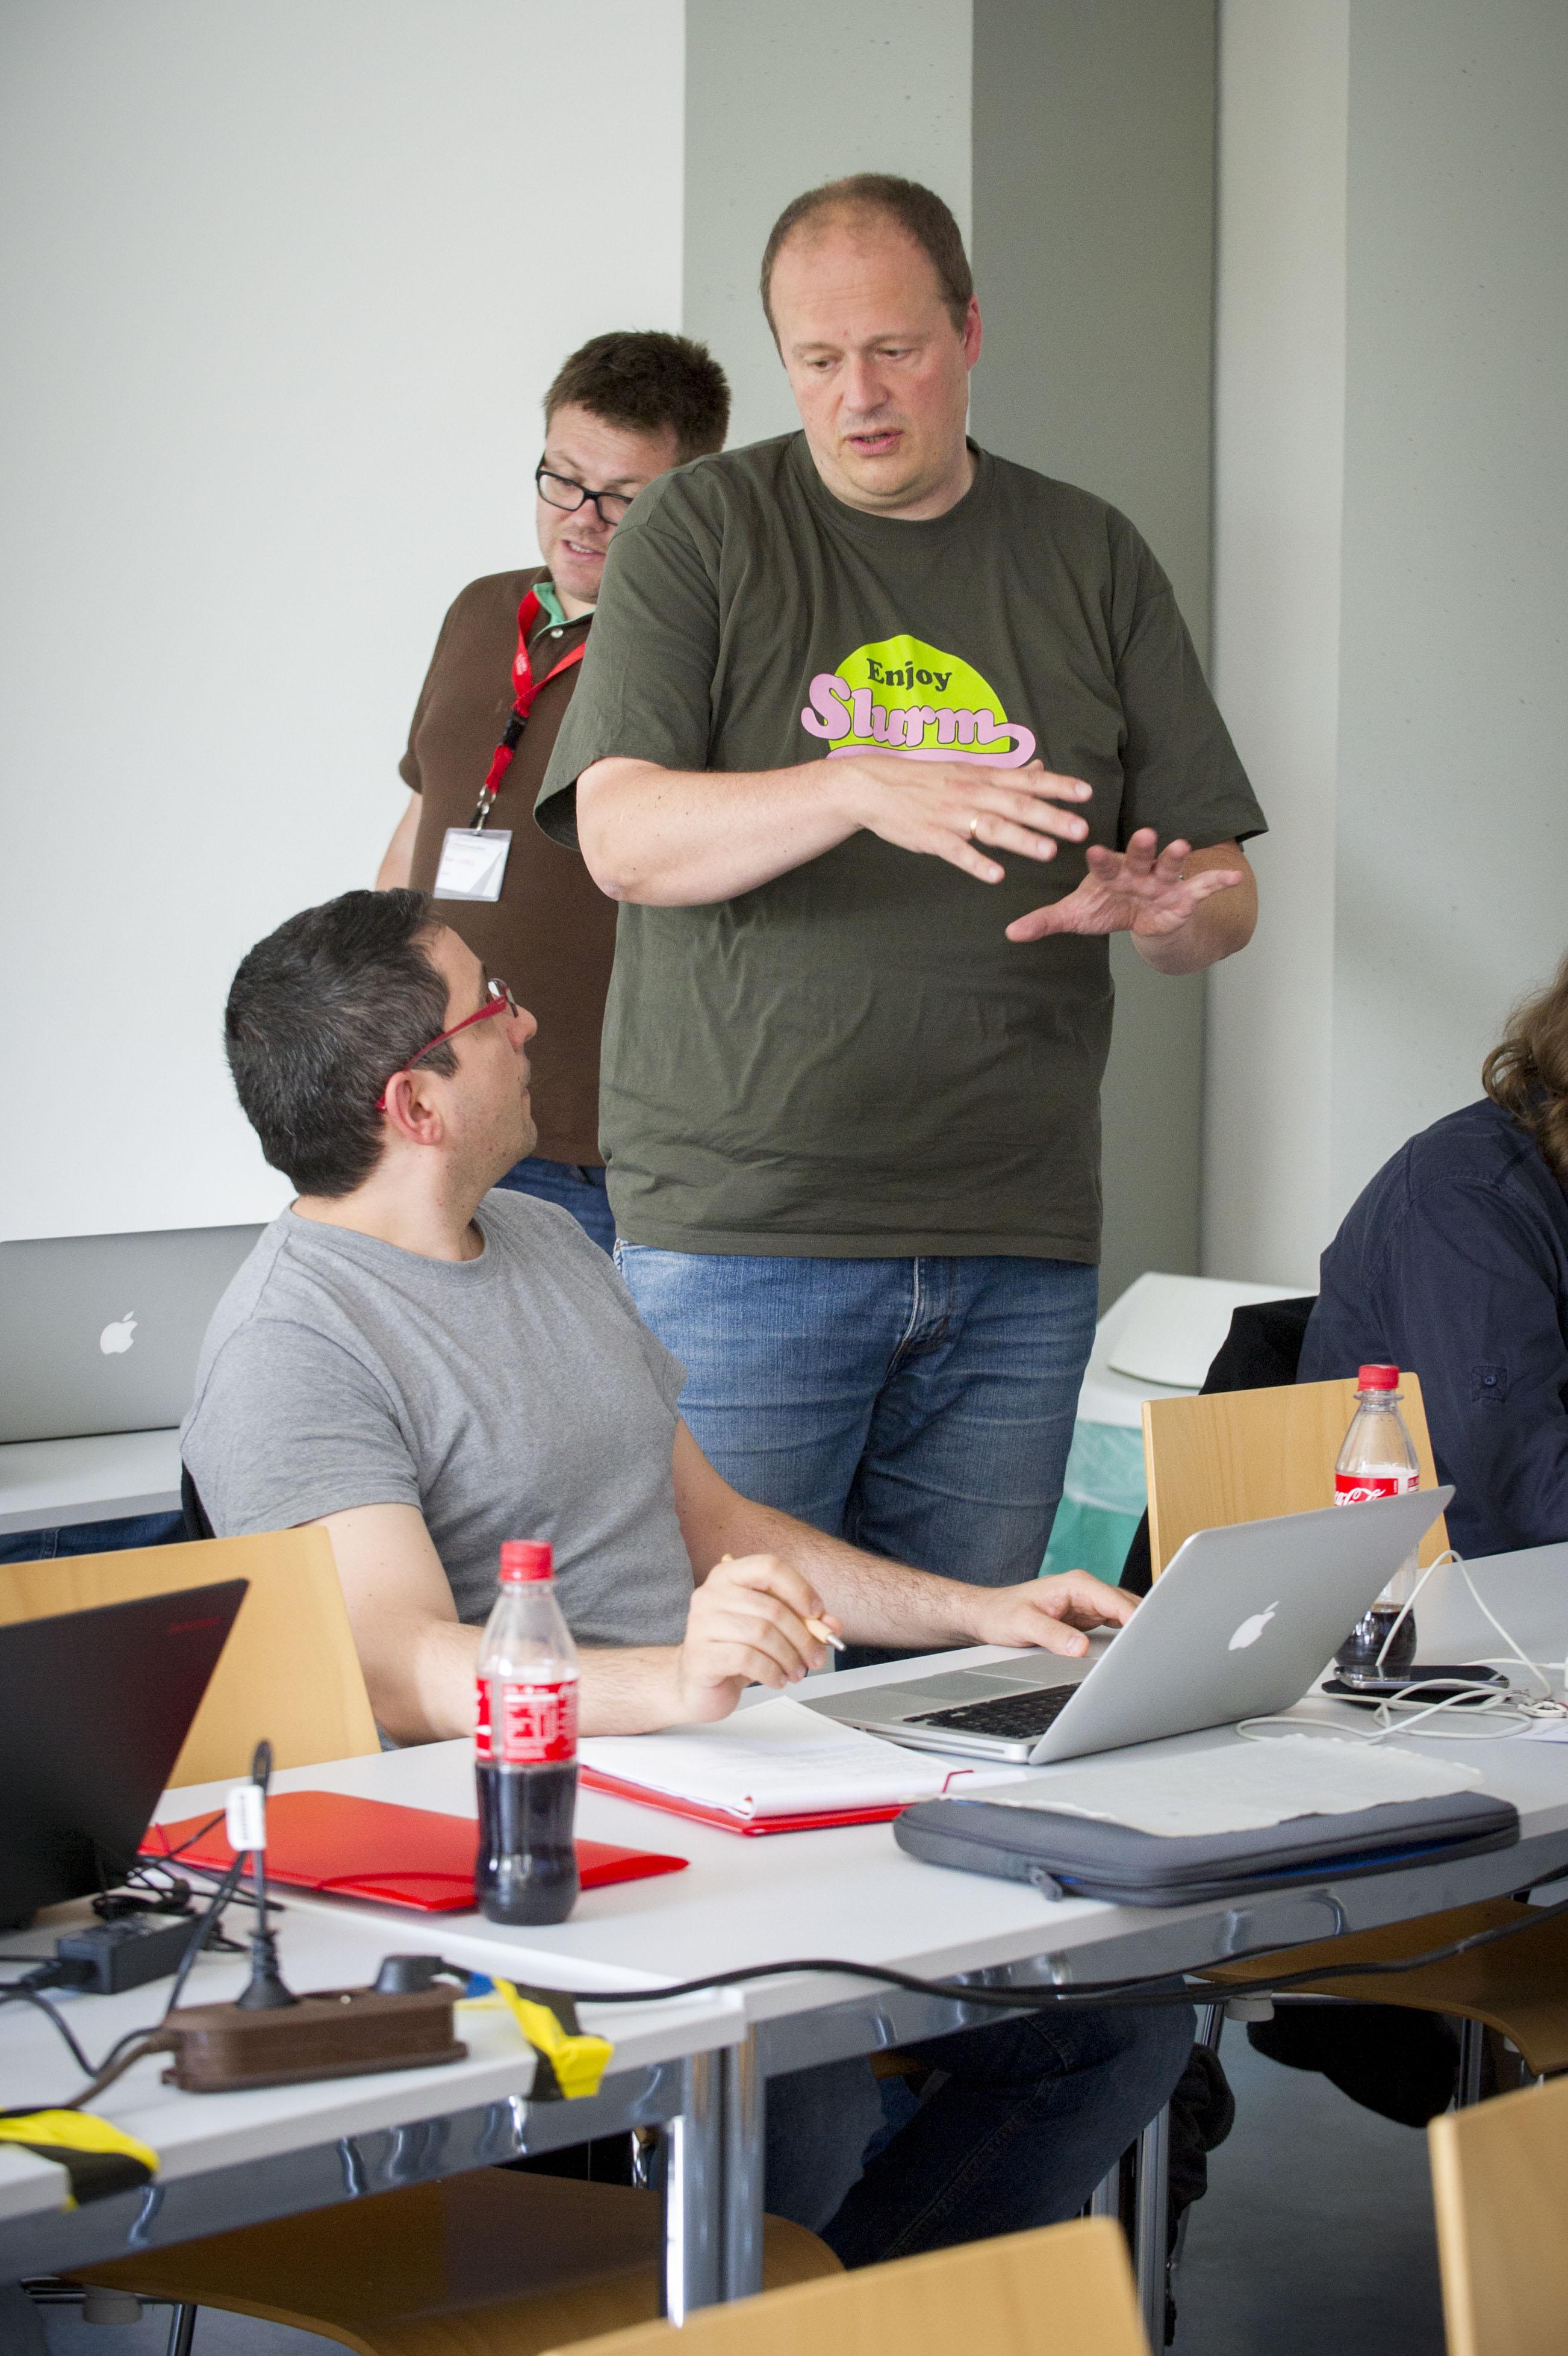 Puppet management workshop with Sven Sternberger and Ben Jones (photo by Tanja Meissner, KIT)